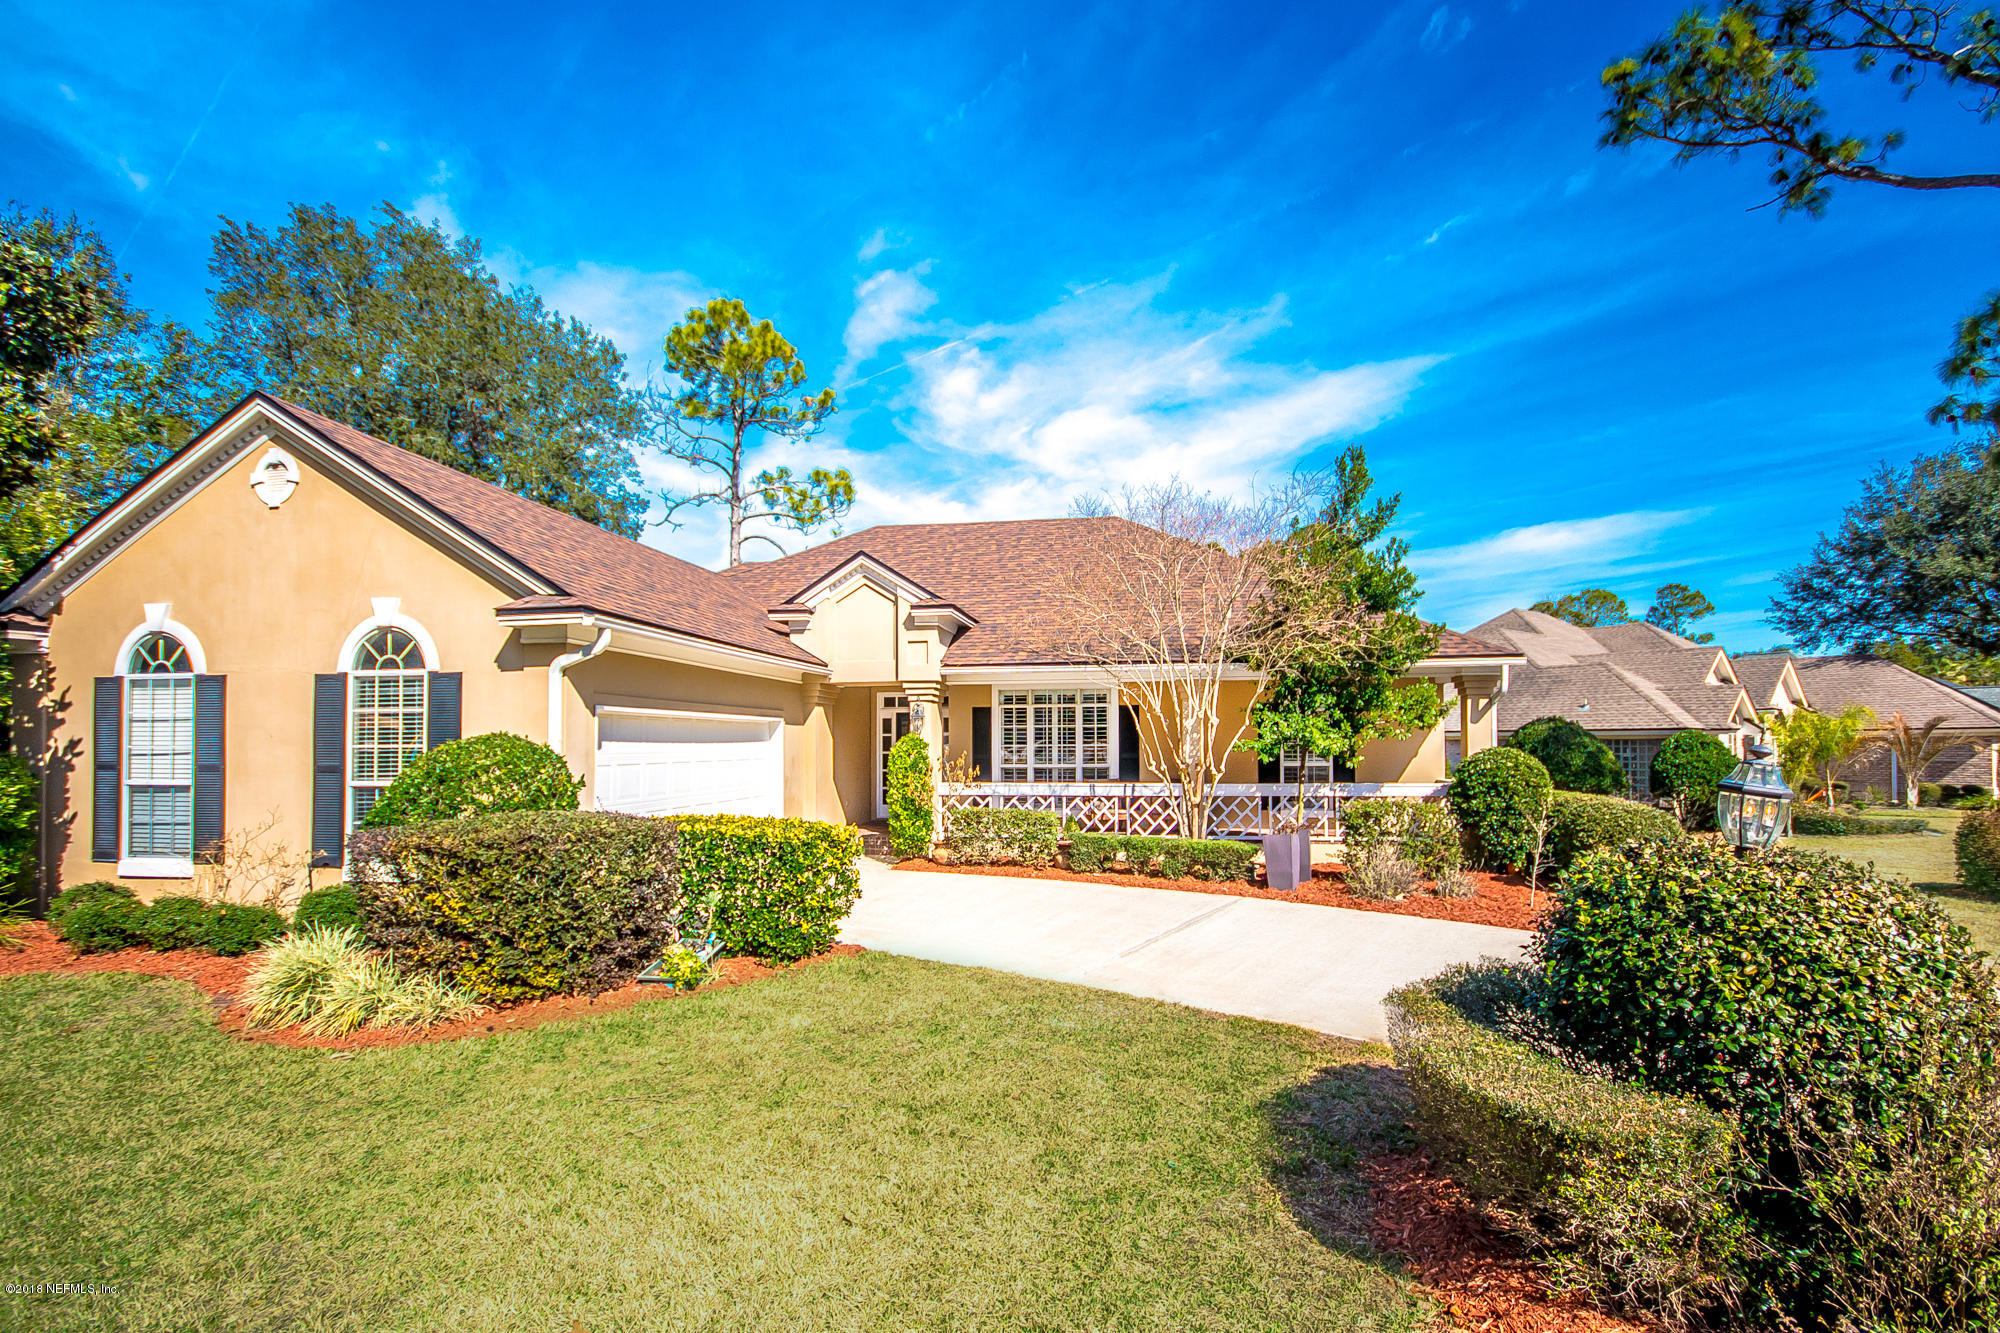 12849 HUNTLEY MANOR, JACKSONVILLE, FLORIDA 32224, 4 Bedrooms Bedrooms, ,3 BathroomsBathrooms,Residential - single family,For sale,HUNTLEY MANOR,919331